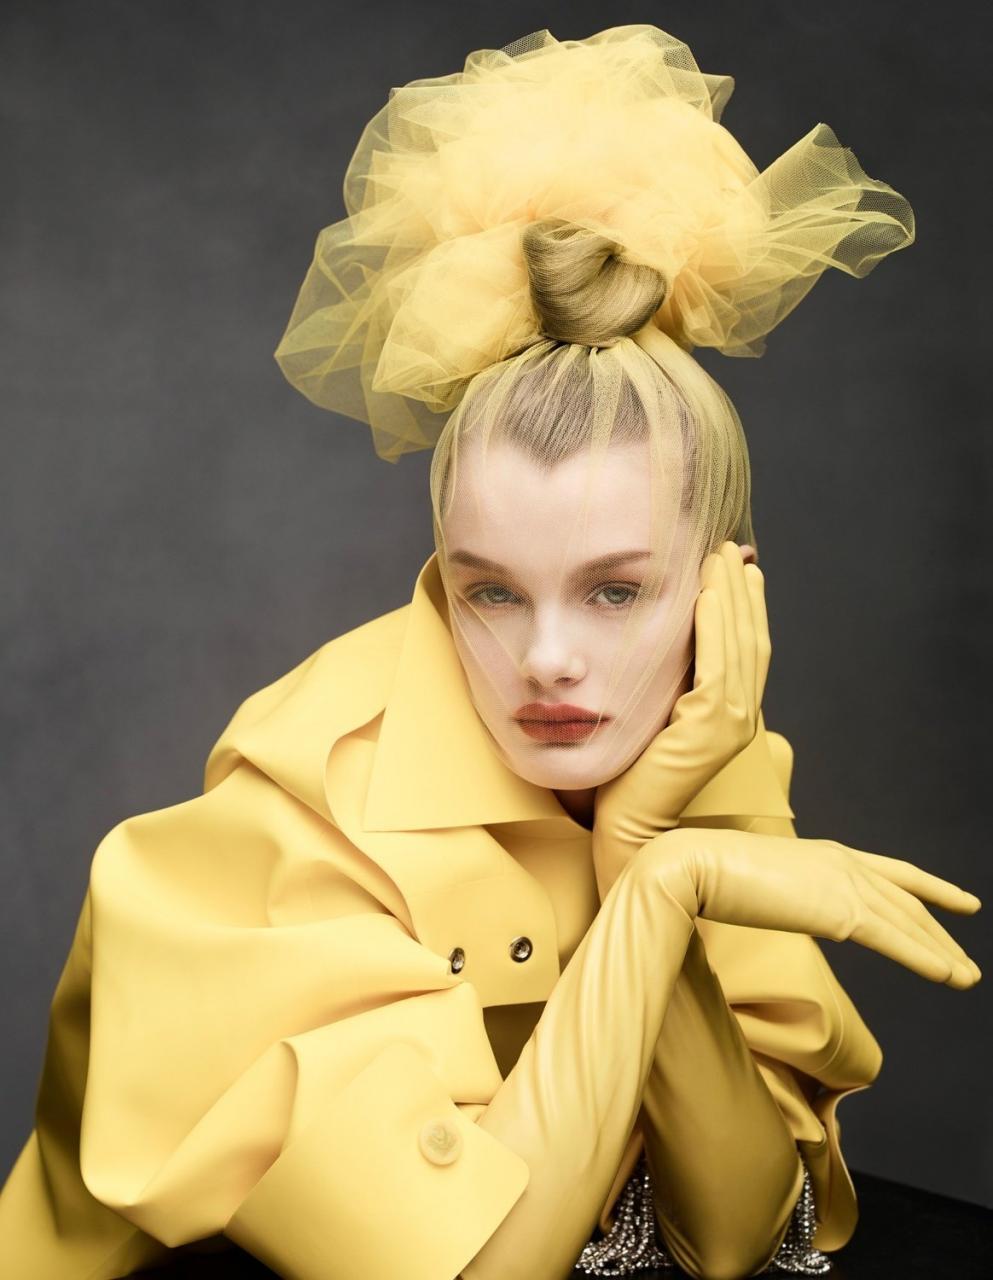 《VOGUE》中国版2019年1月刊 超模Kris Grikaite出镜 时尚图库 第13张